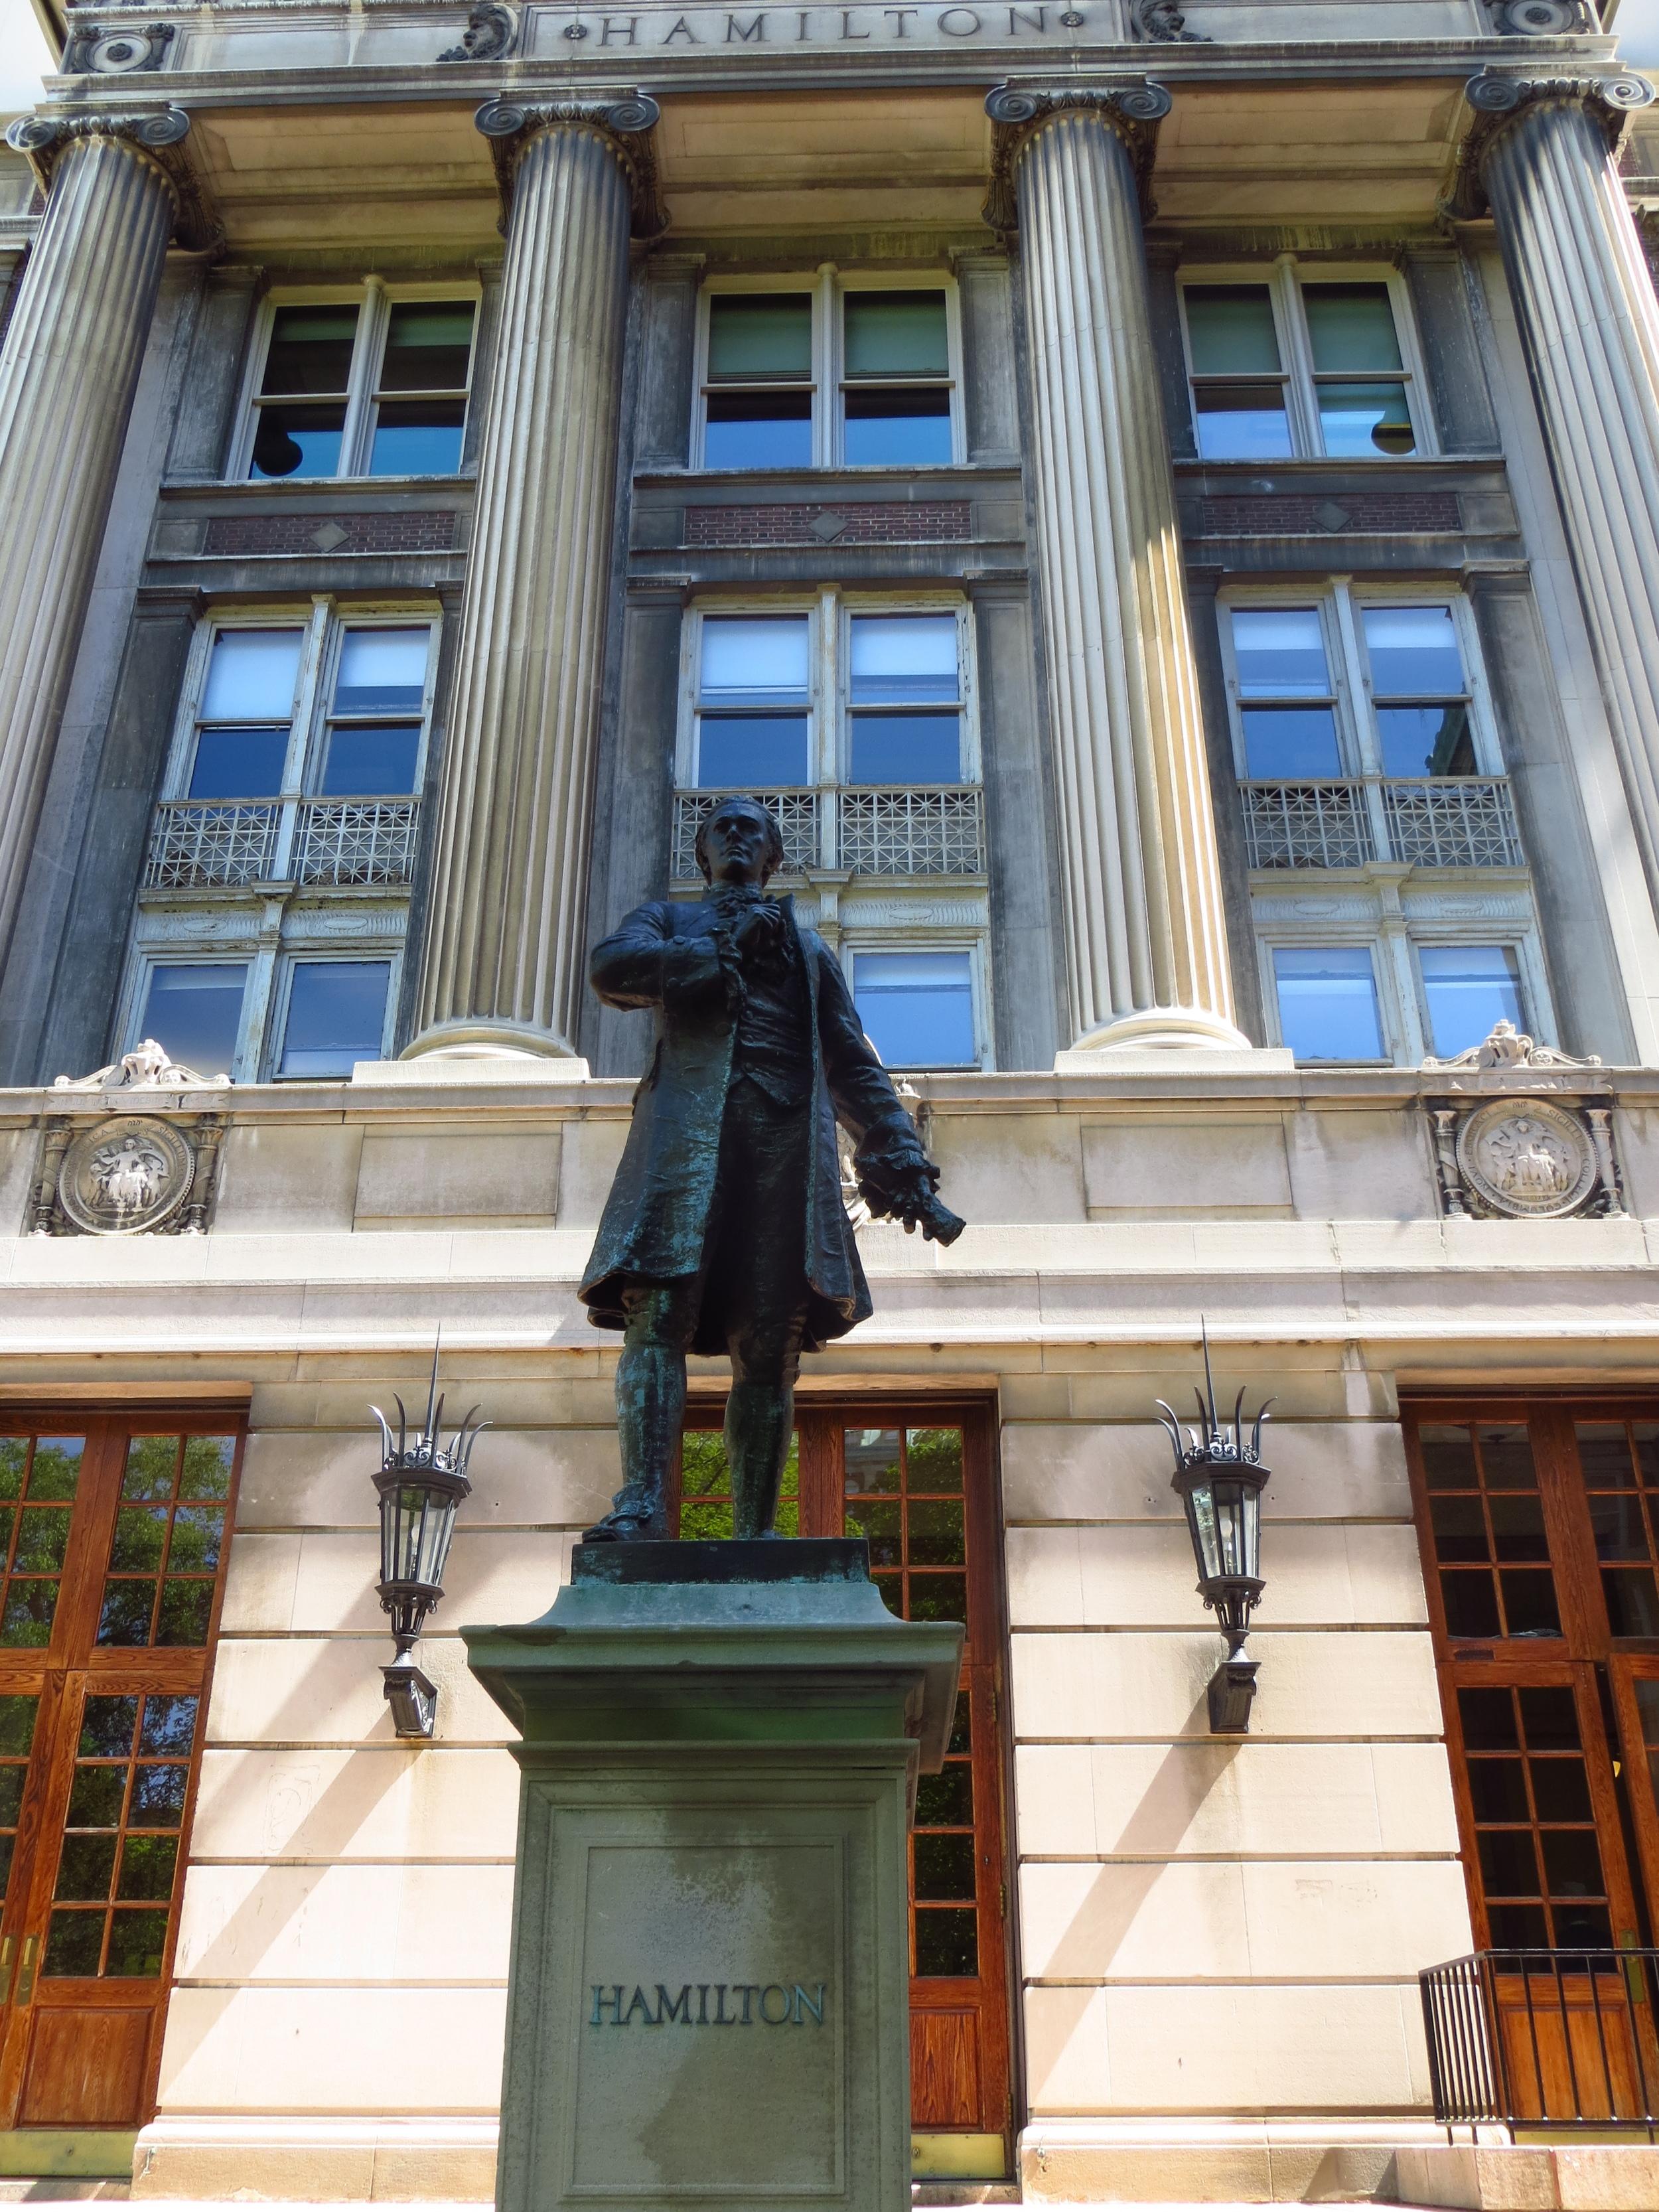 Alexander Hamilton (Columbia alum)